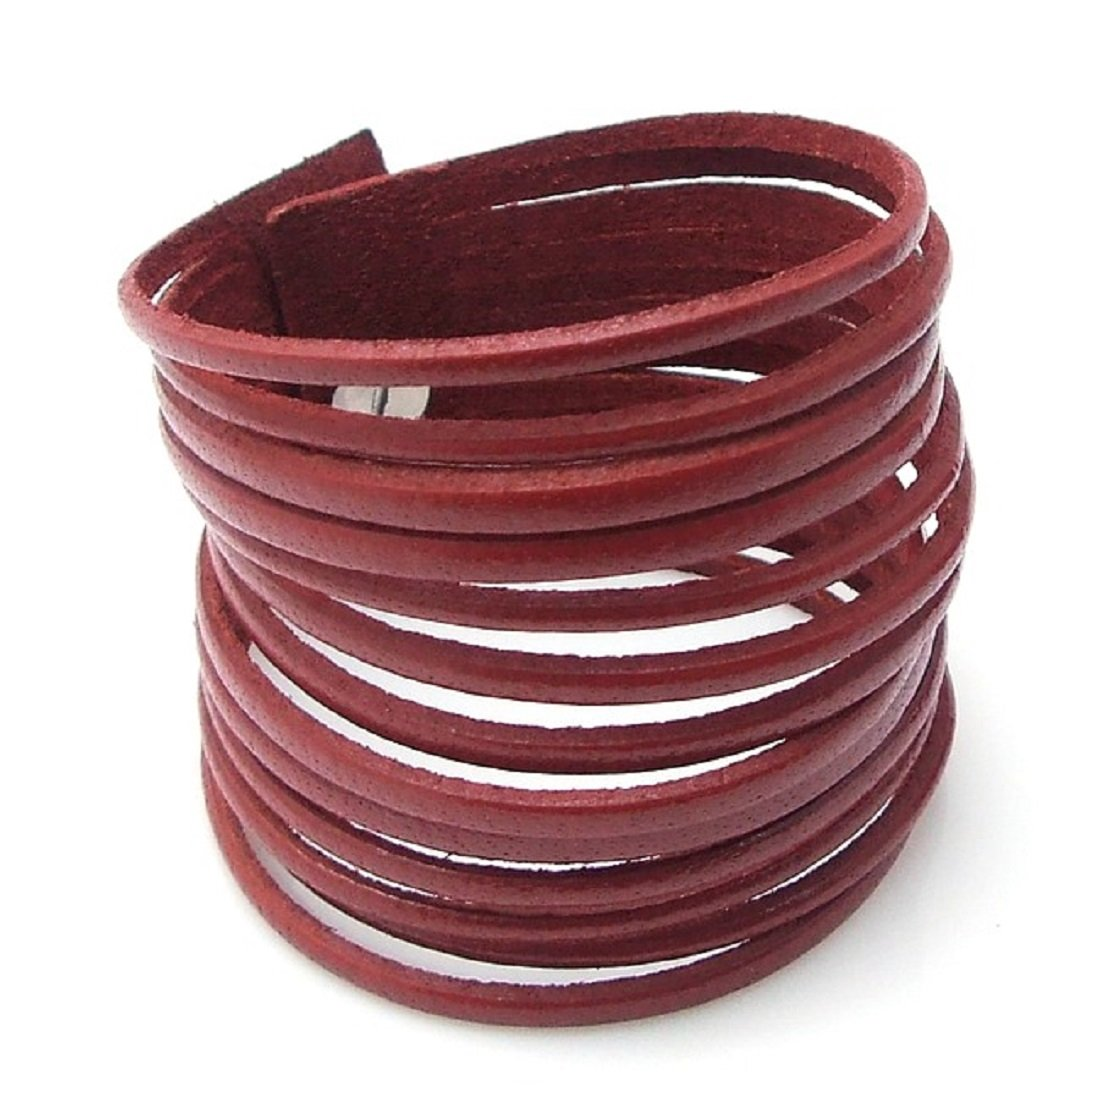 AeraVida Cut Out Trendy Genuine Red Leather Bracelet